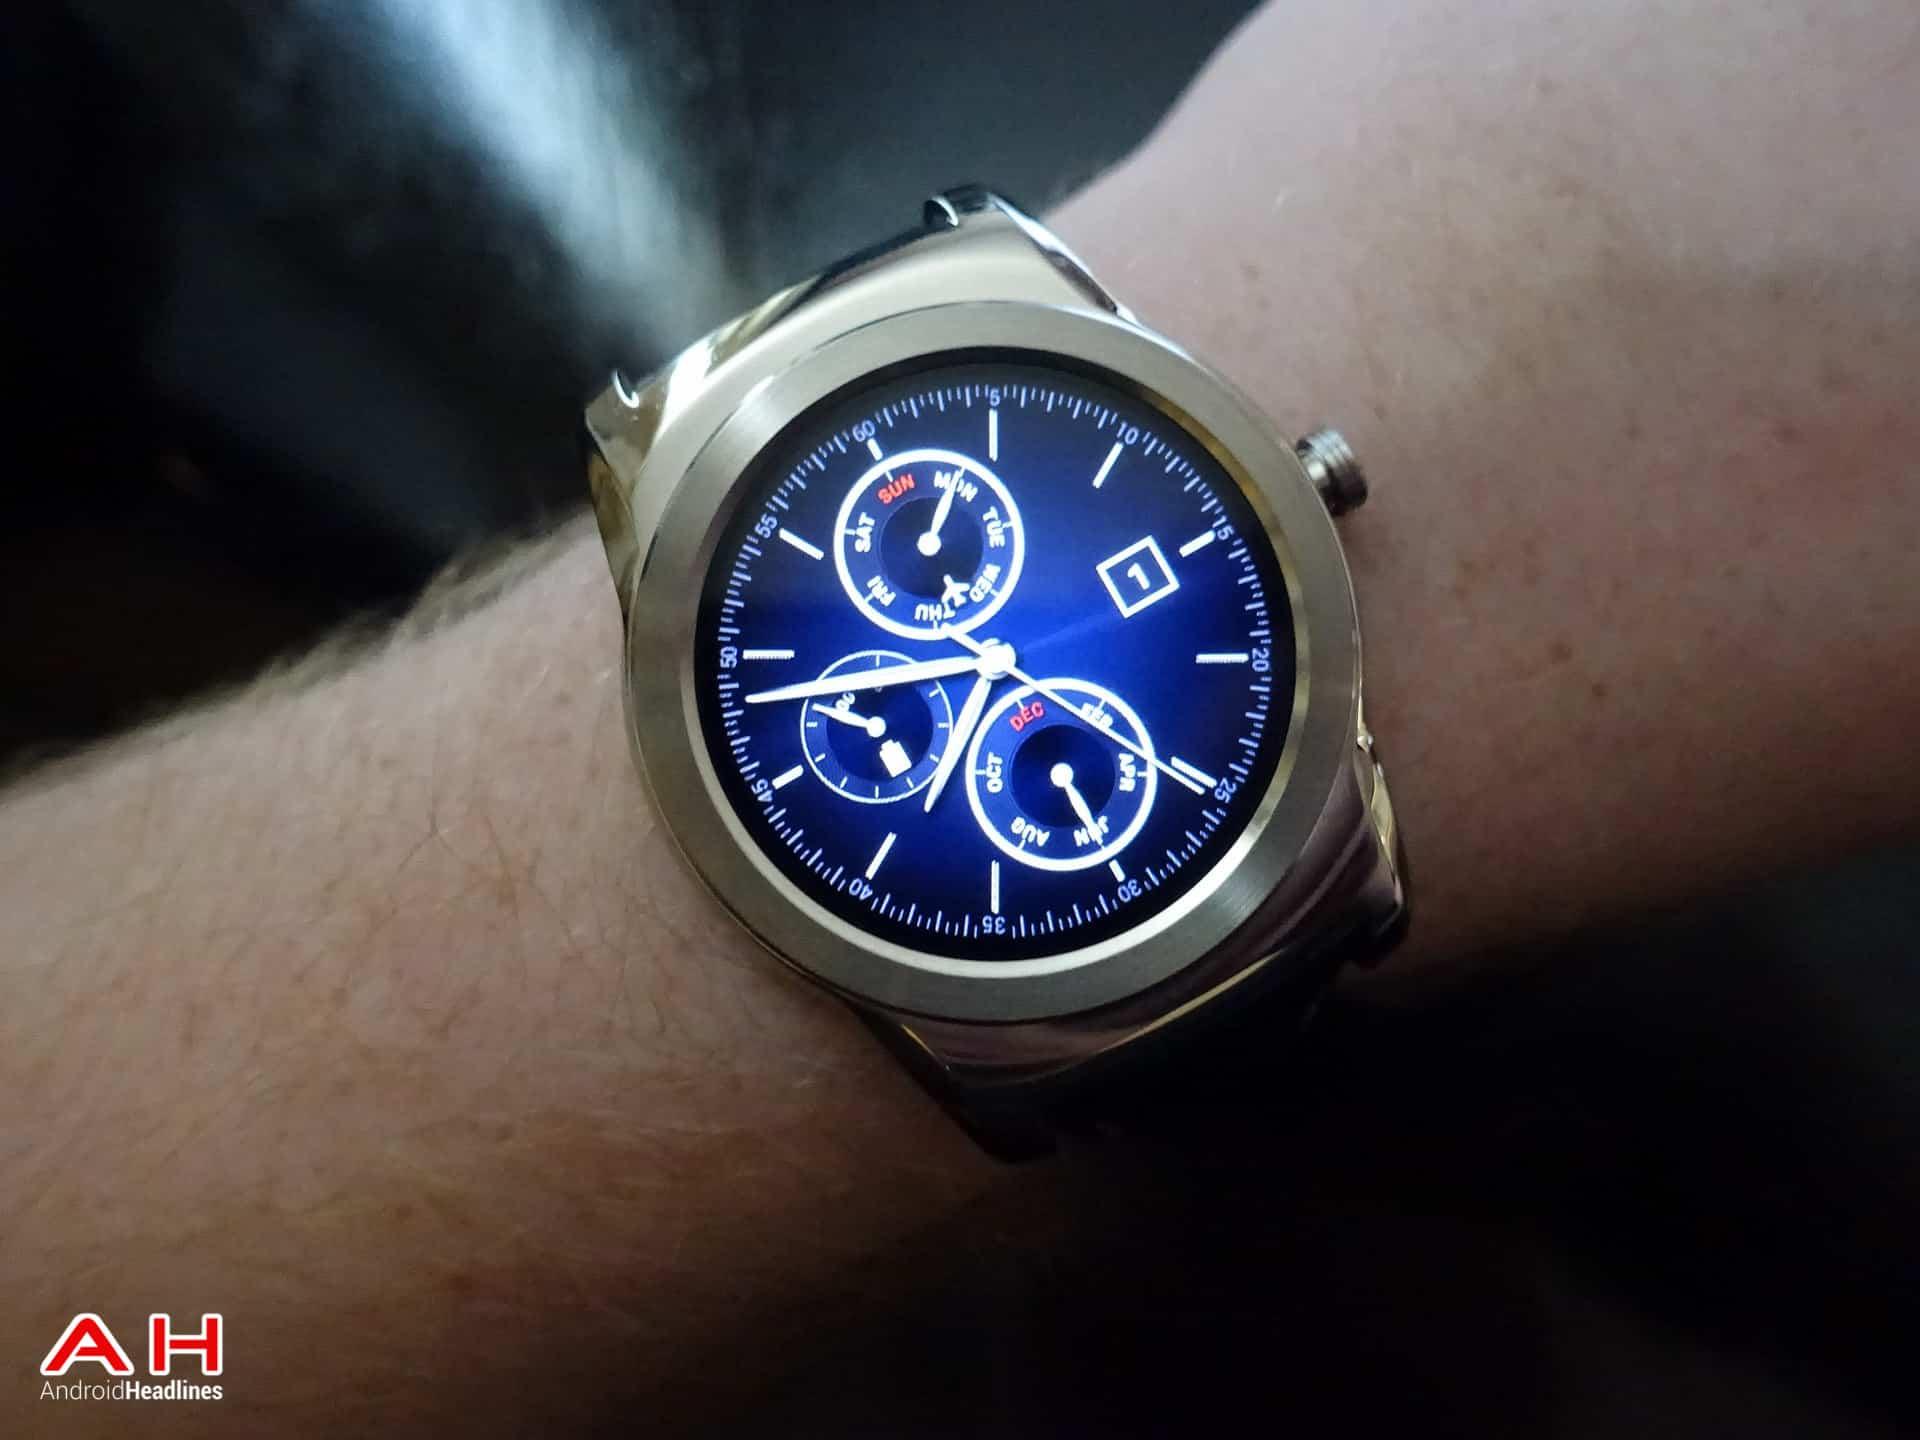 LG-Watch-Urbane-Review-AH-3